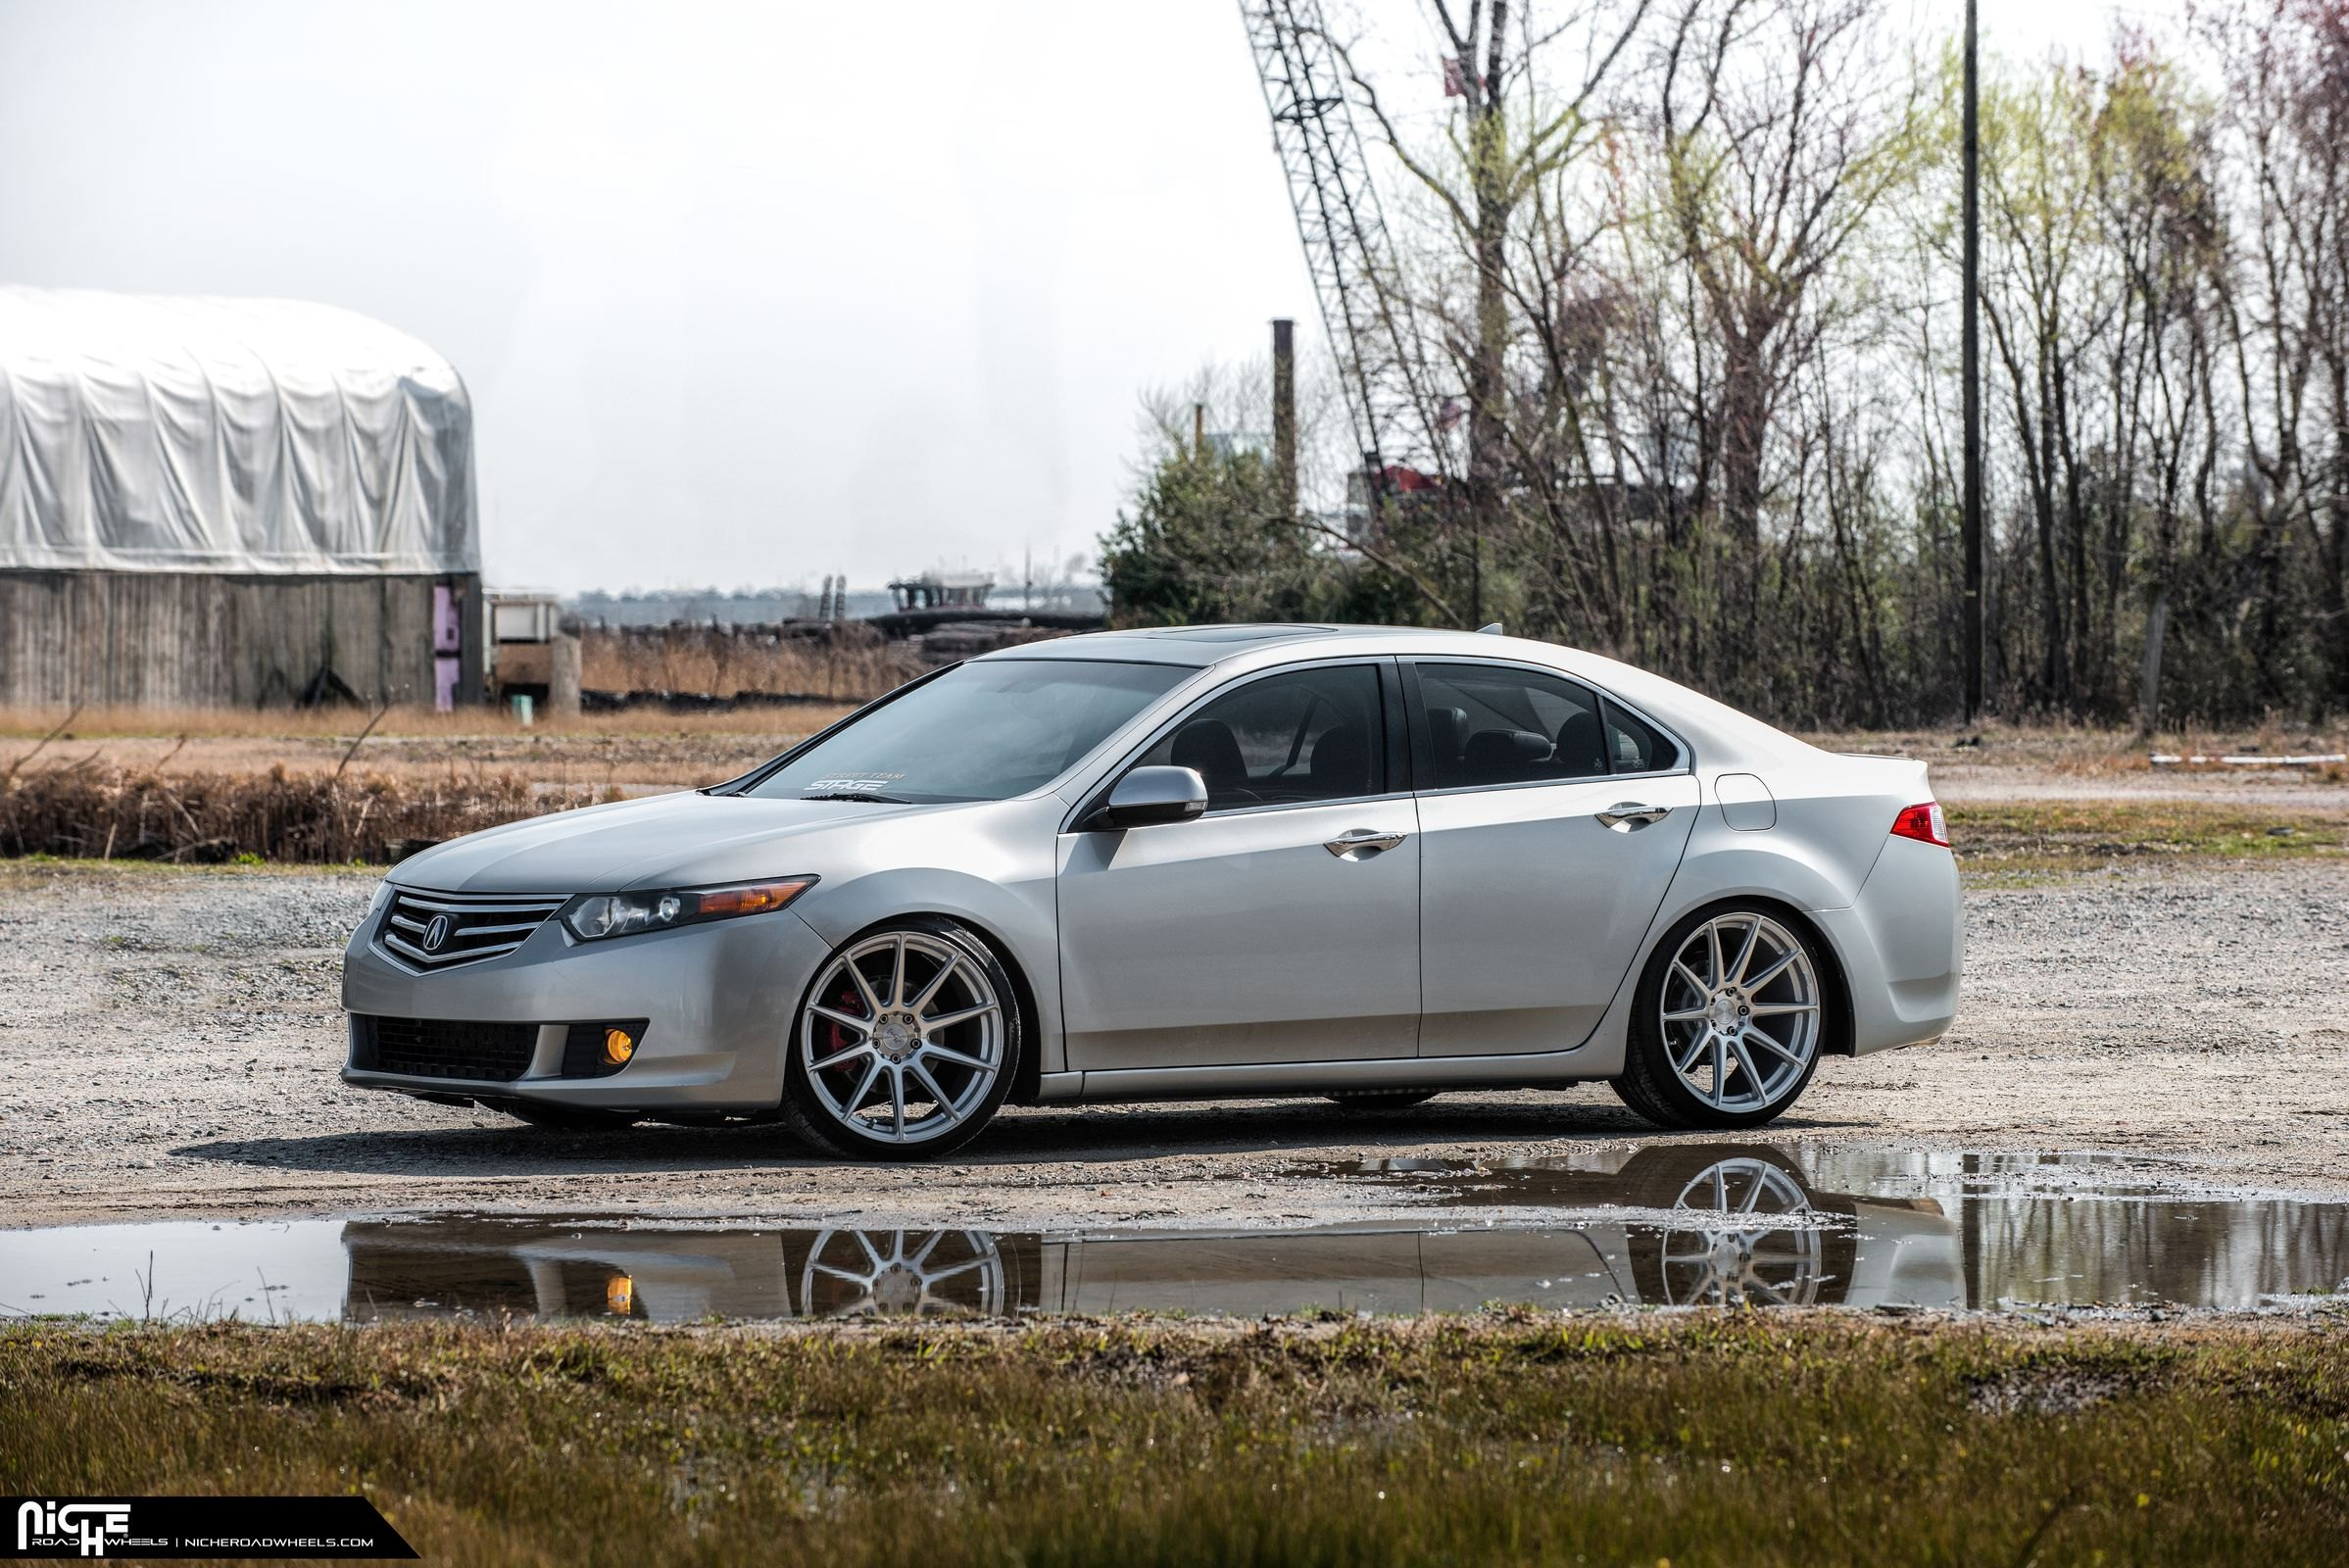 Custom Niche Wheels Enrich Acura TSX Exterior Style CARiDcom Gallery - Rims for acura tsx